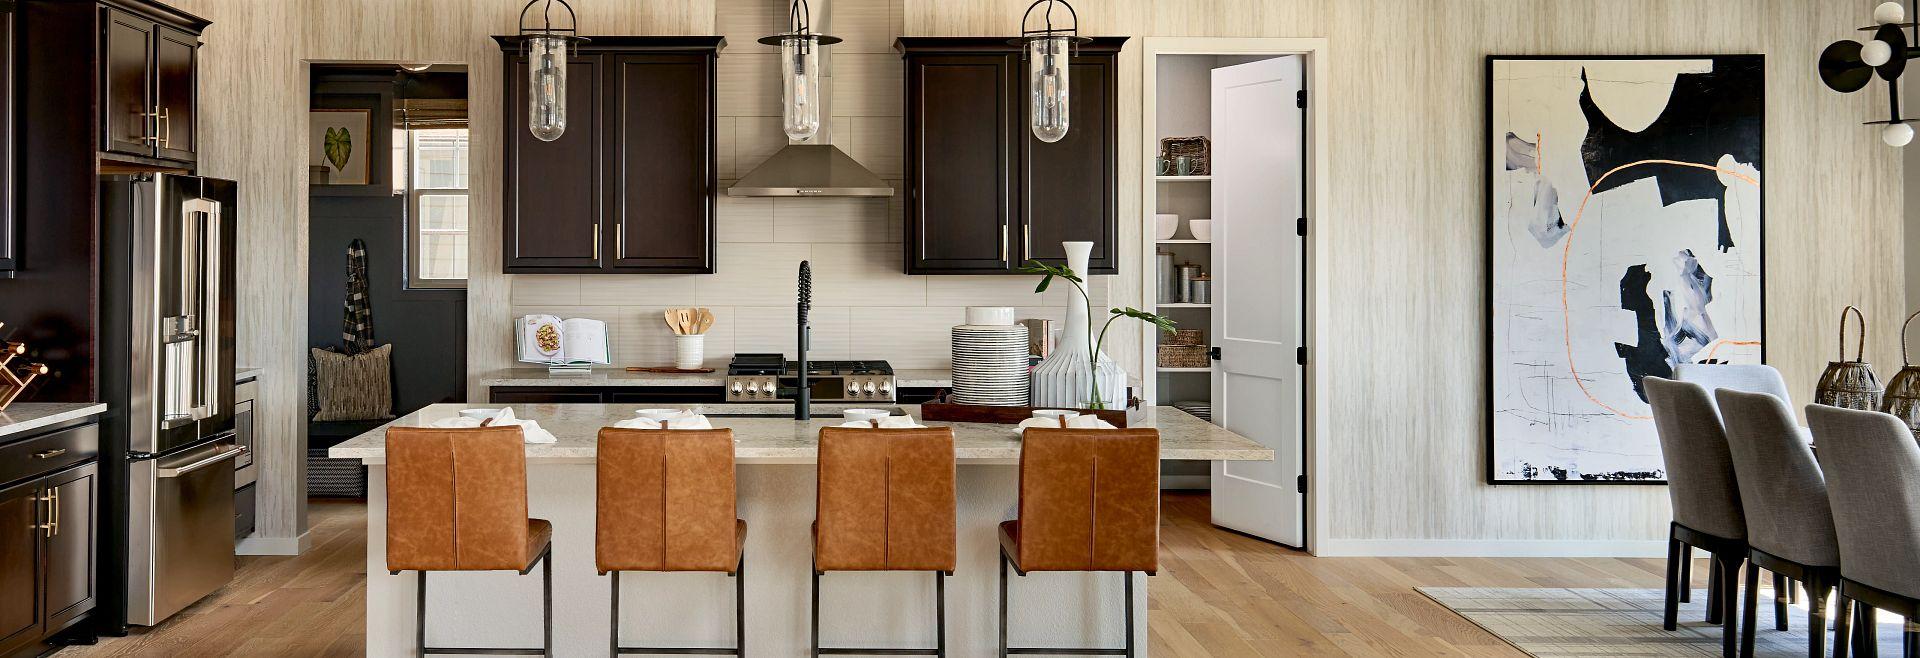 Solstice Stargaze Morningside Kitchen